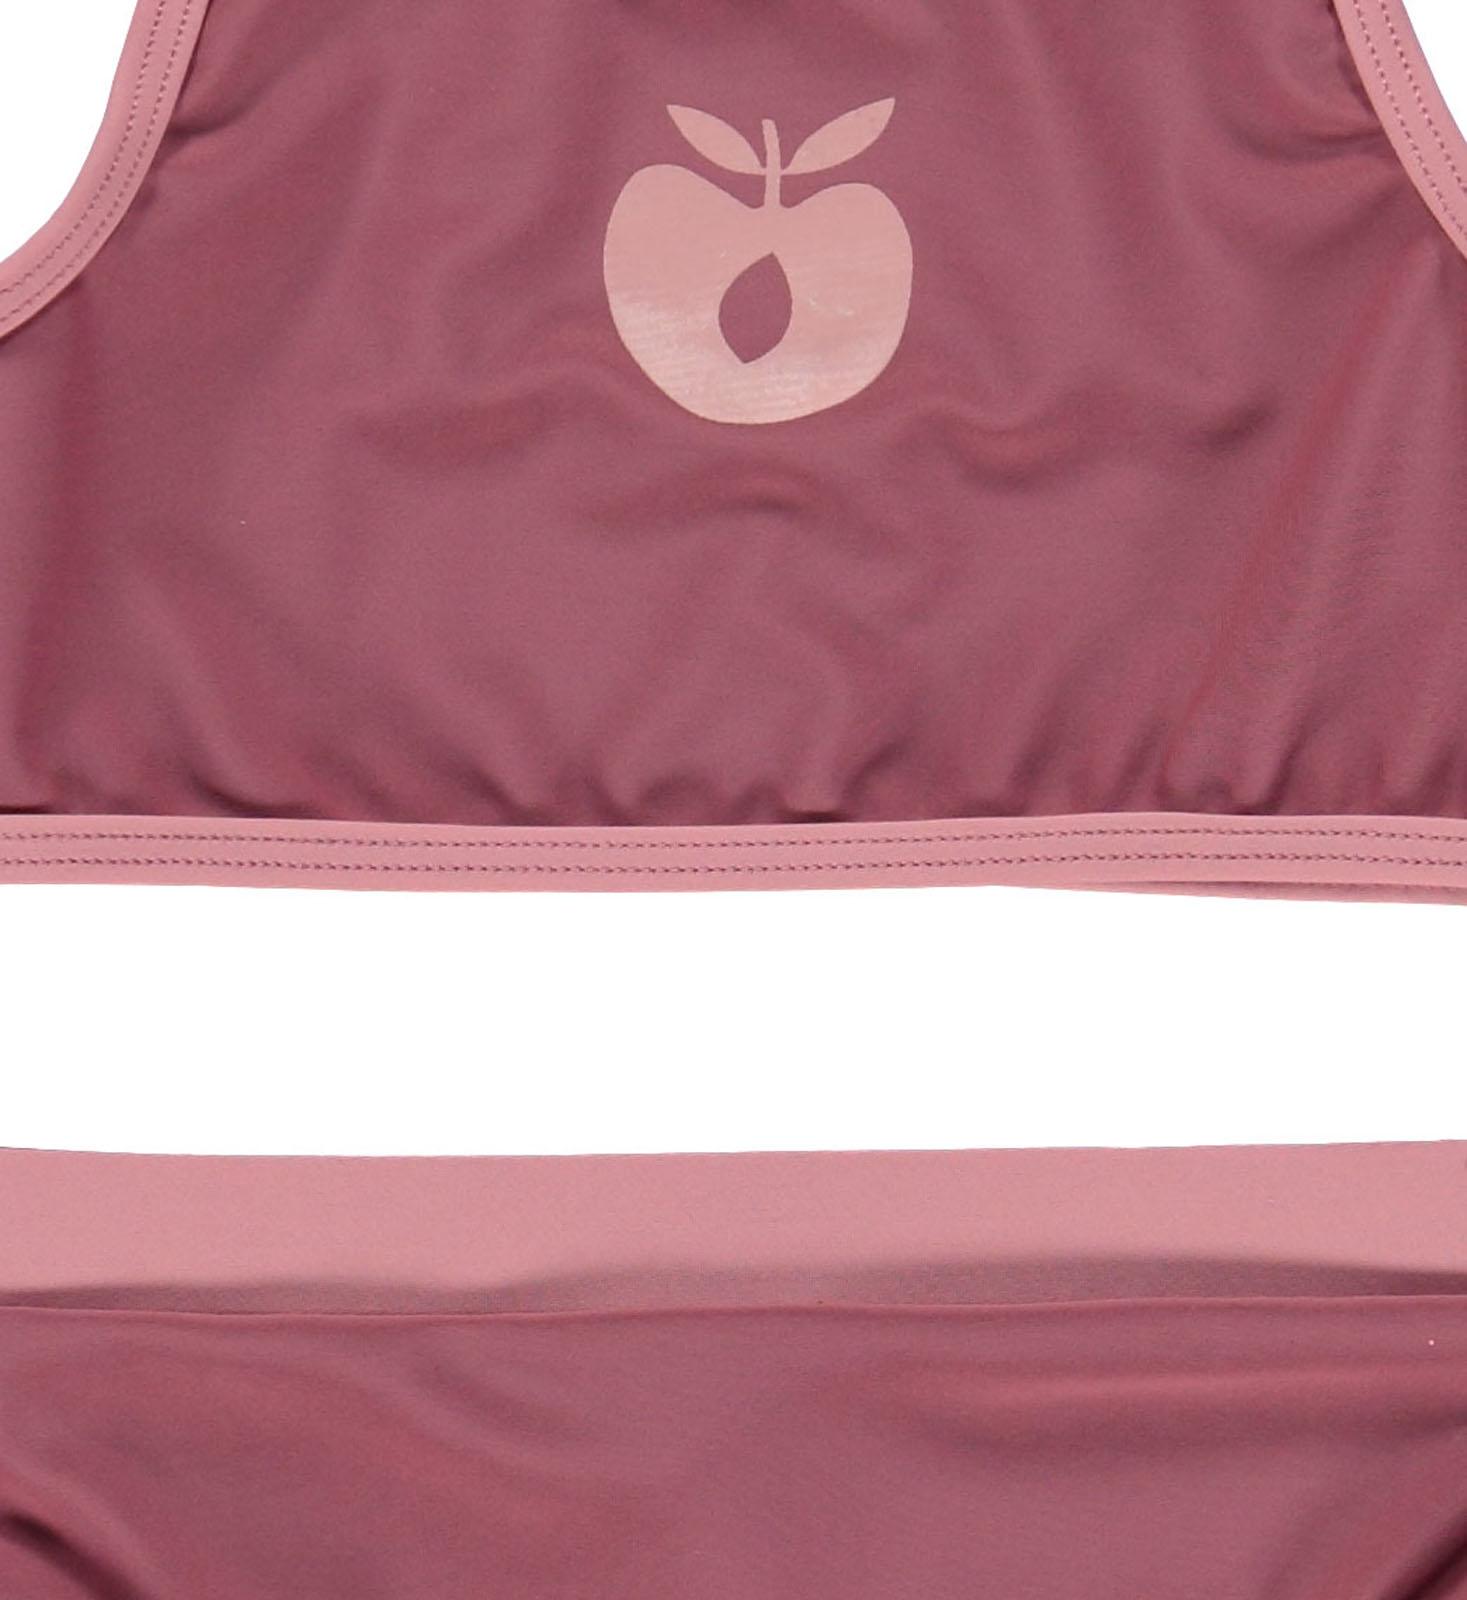 Smafolk Dänische Kindermode Swimwear Badeanzug Apples grey Äpfel